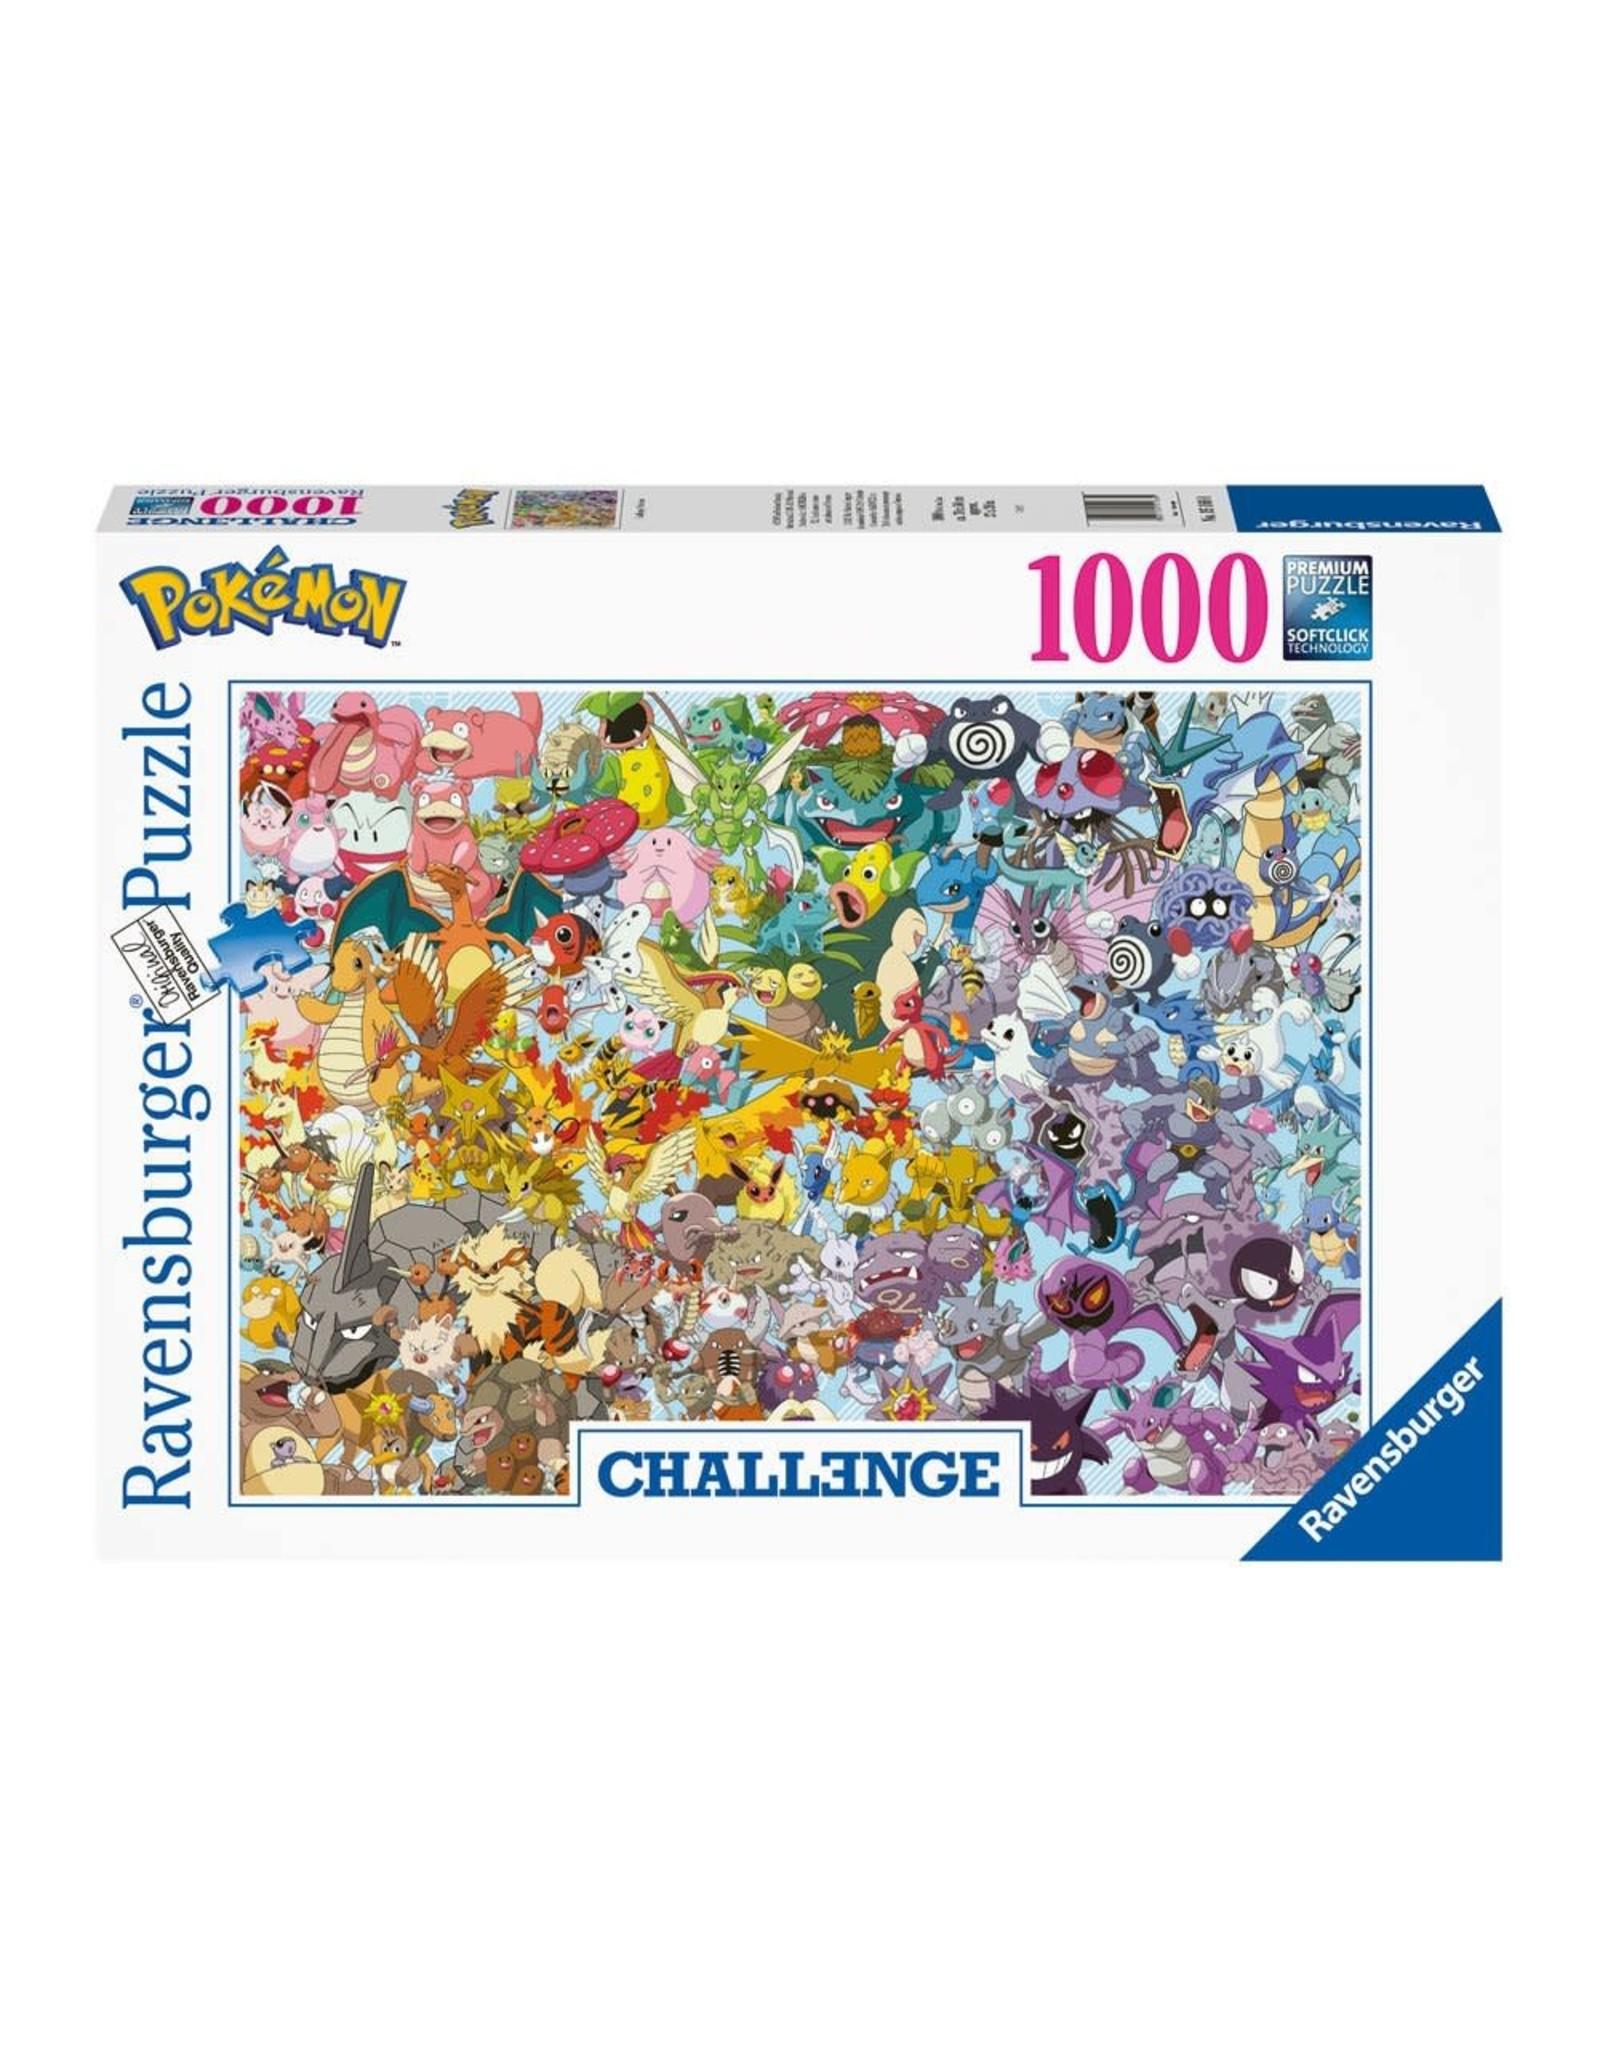 Ravensburger POKEMON Challenge Puzzle 1000P